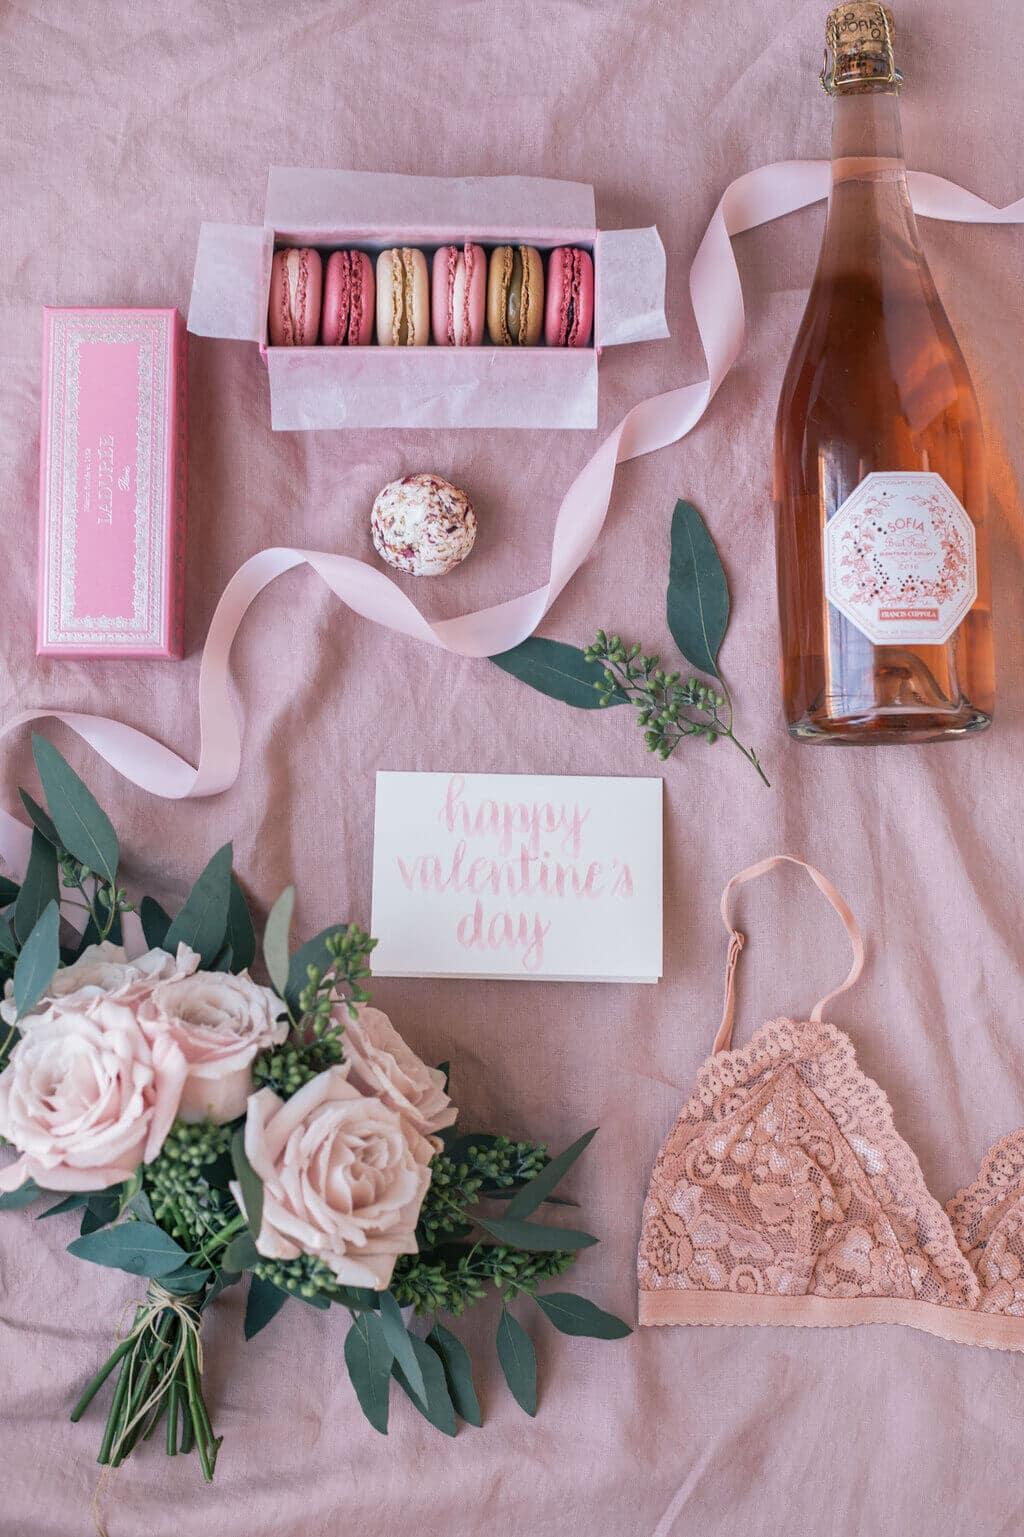 DIY valentine gifts